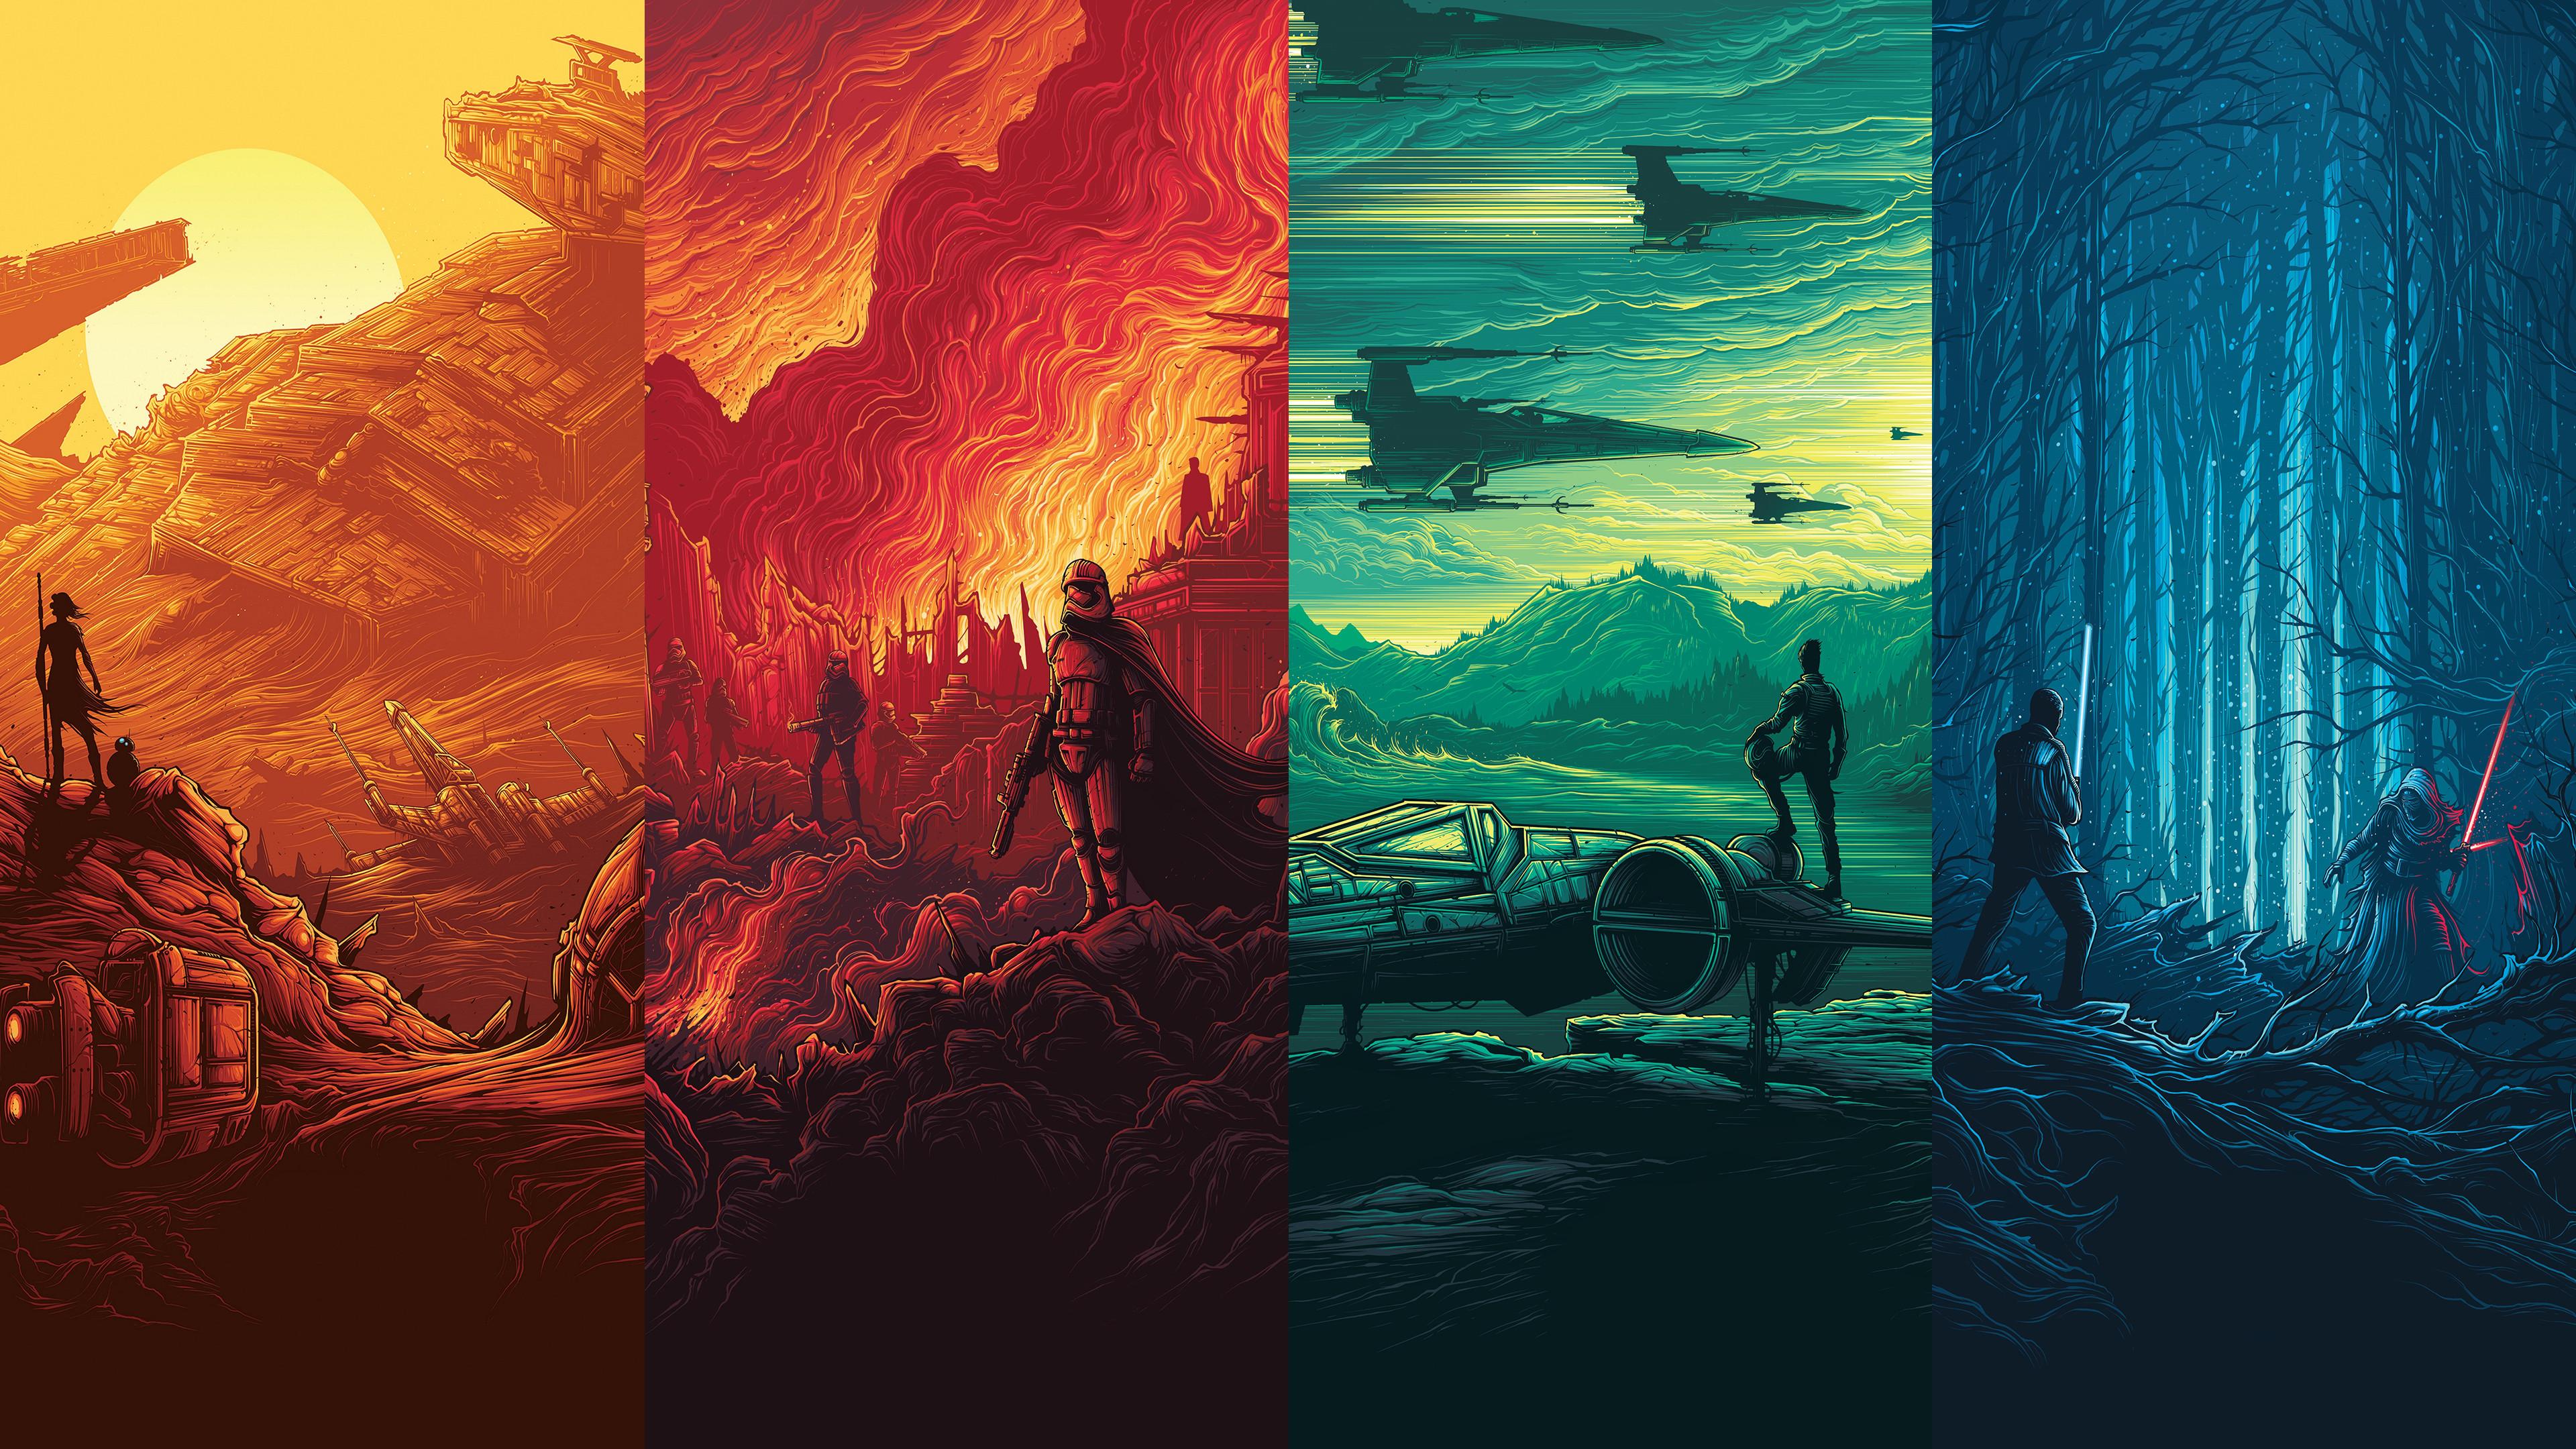 Imax Star Wars posters dual 4k monitors 16 9 HD Wallpaper Collection 3840x2160